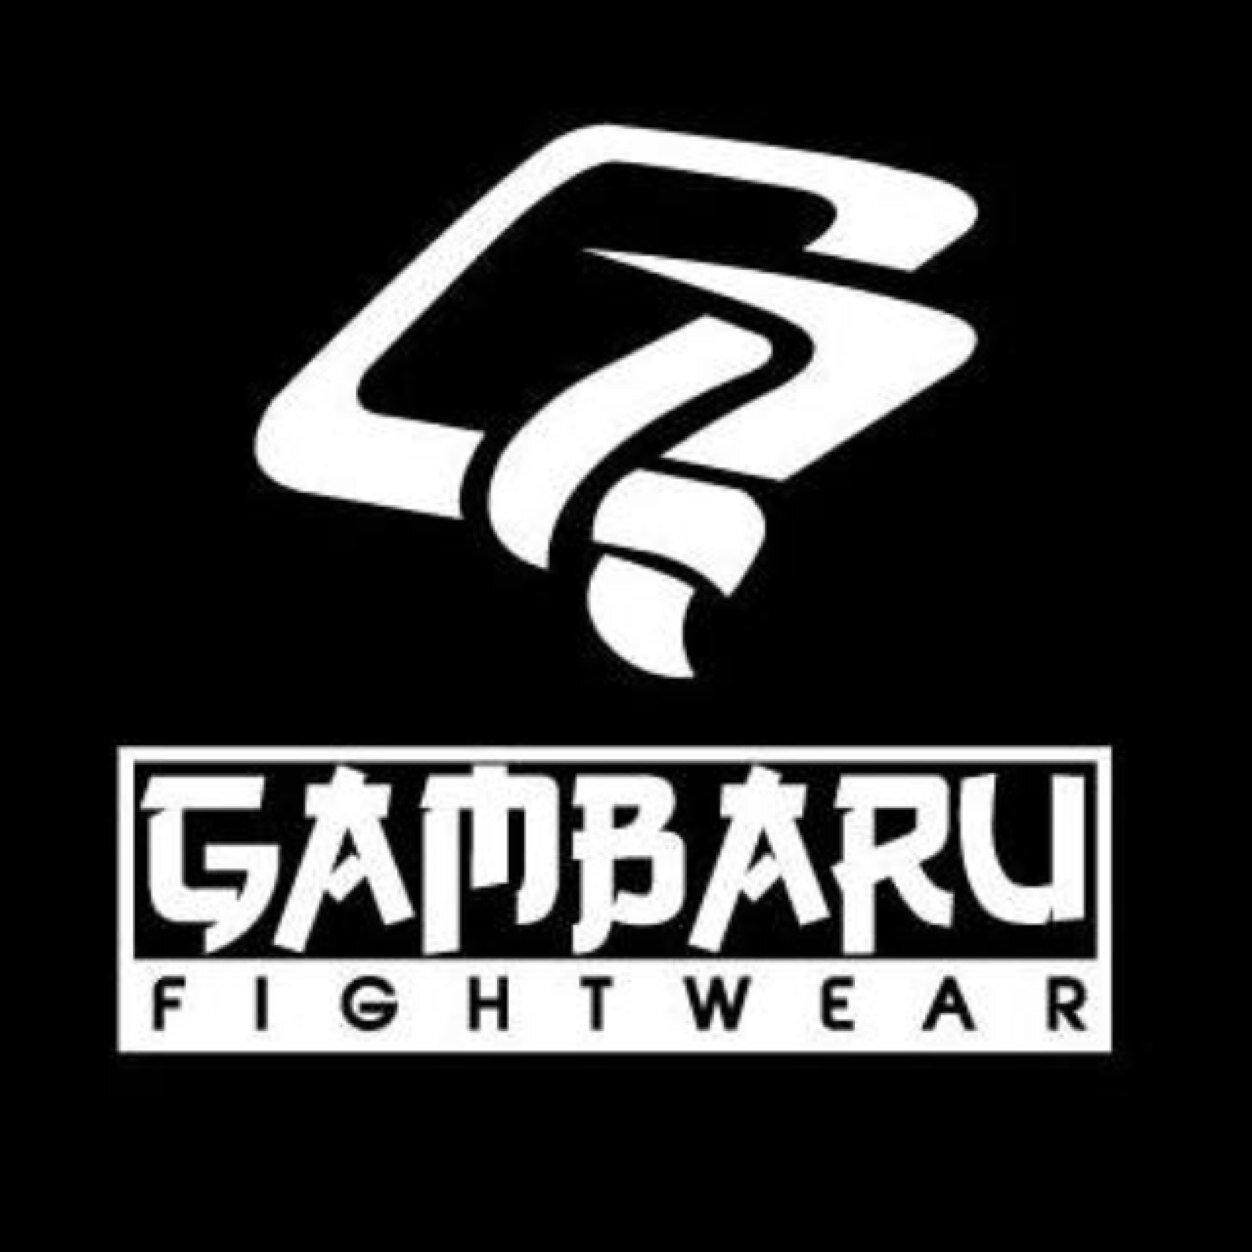 Gambaru Fightwear